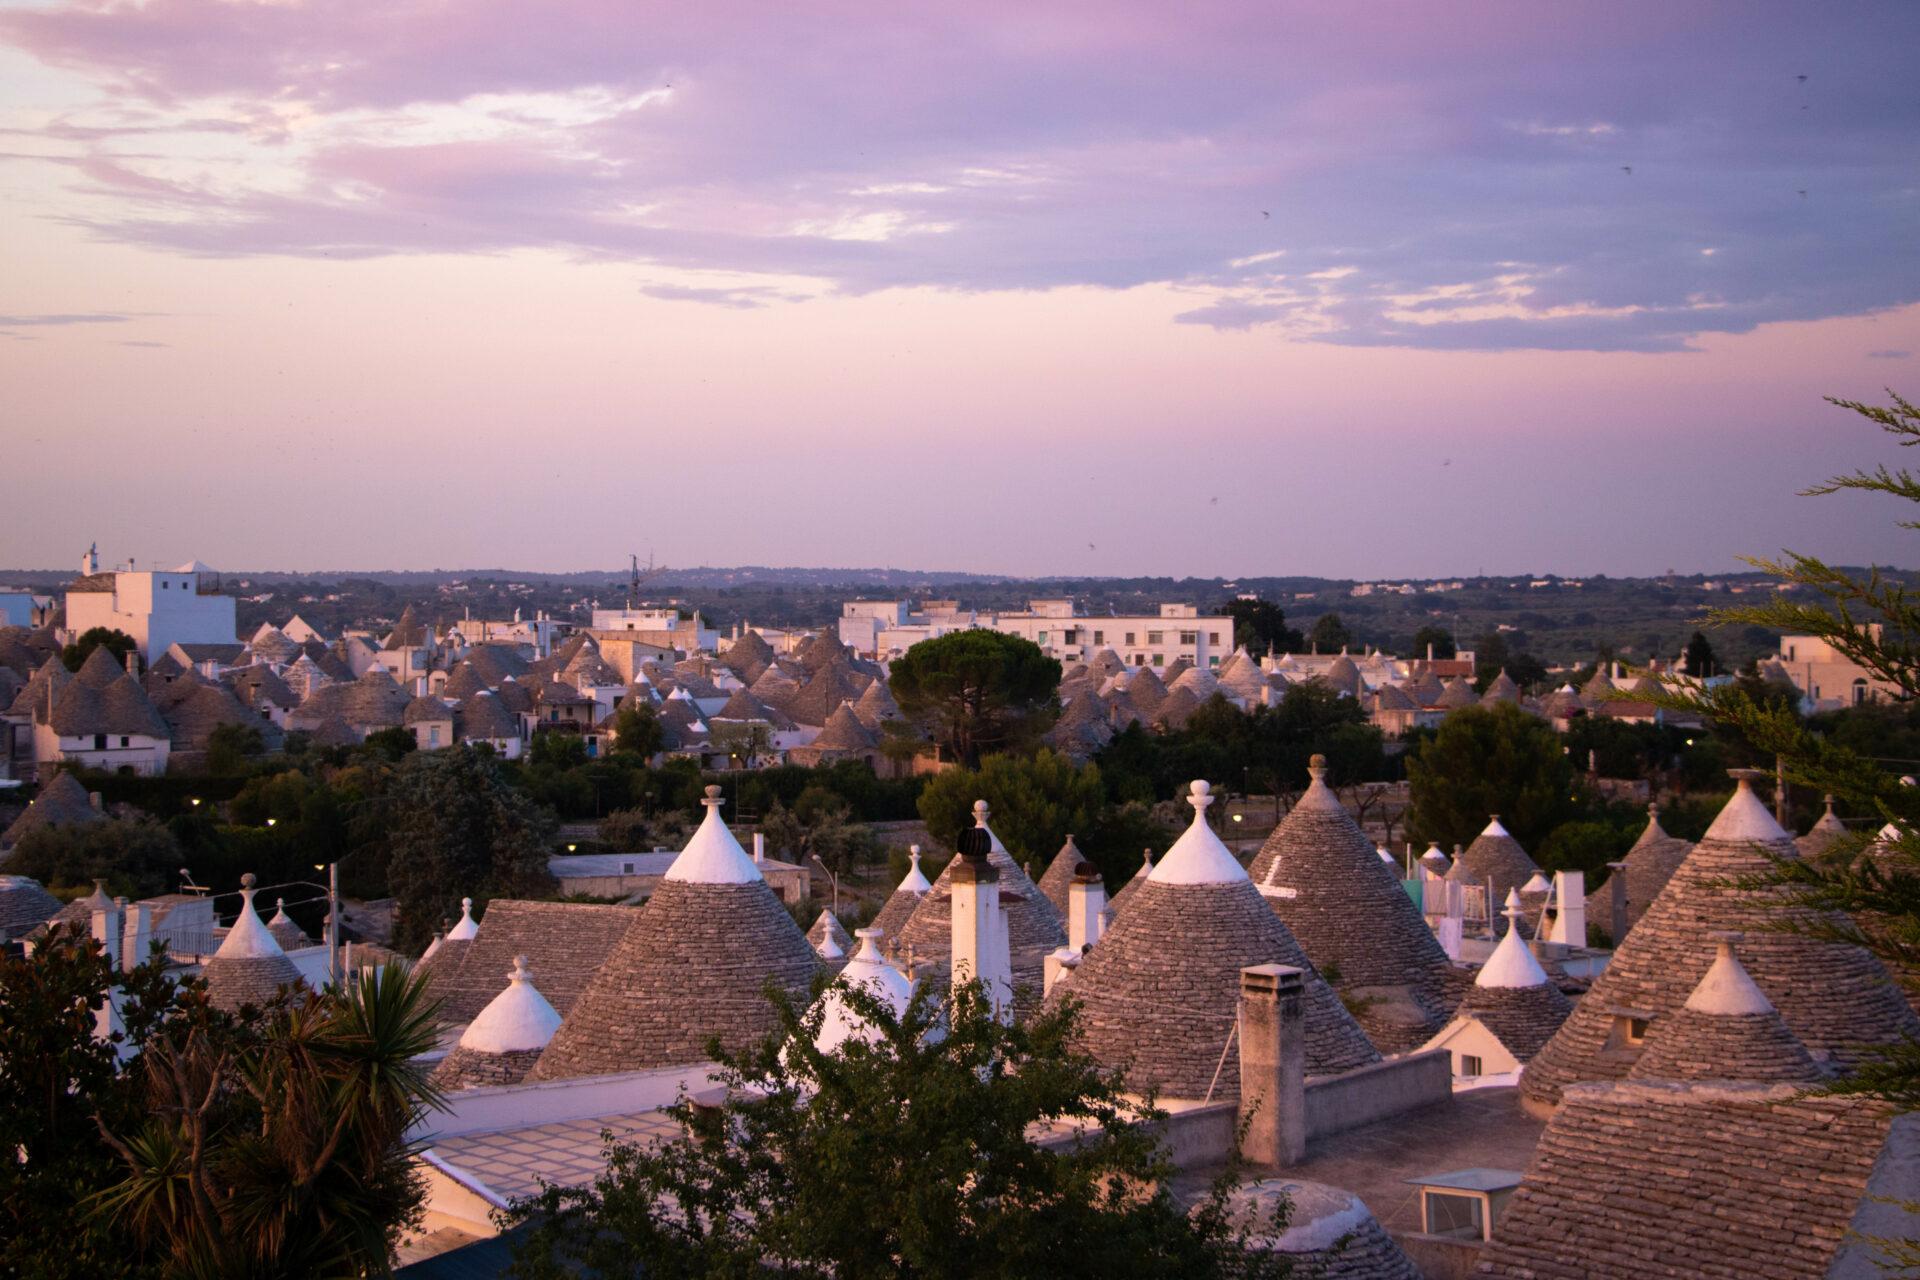 Alberobello Puglia Italy - Travel outside peak season